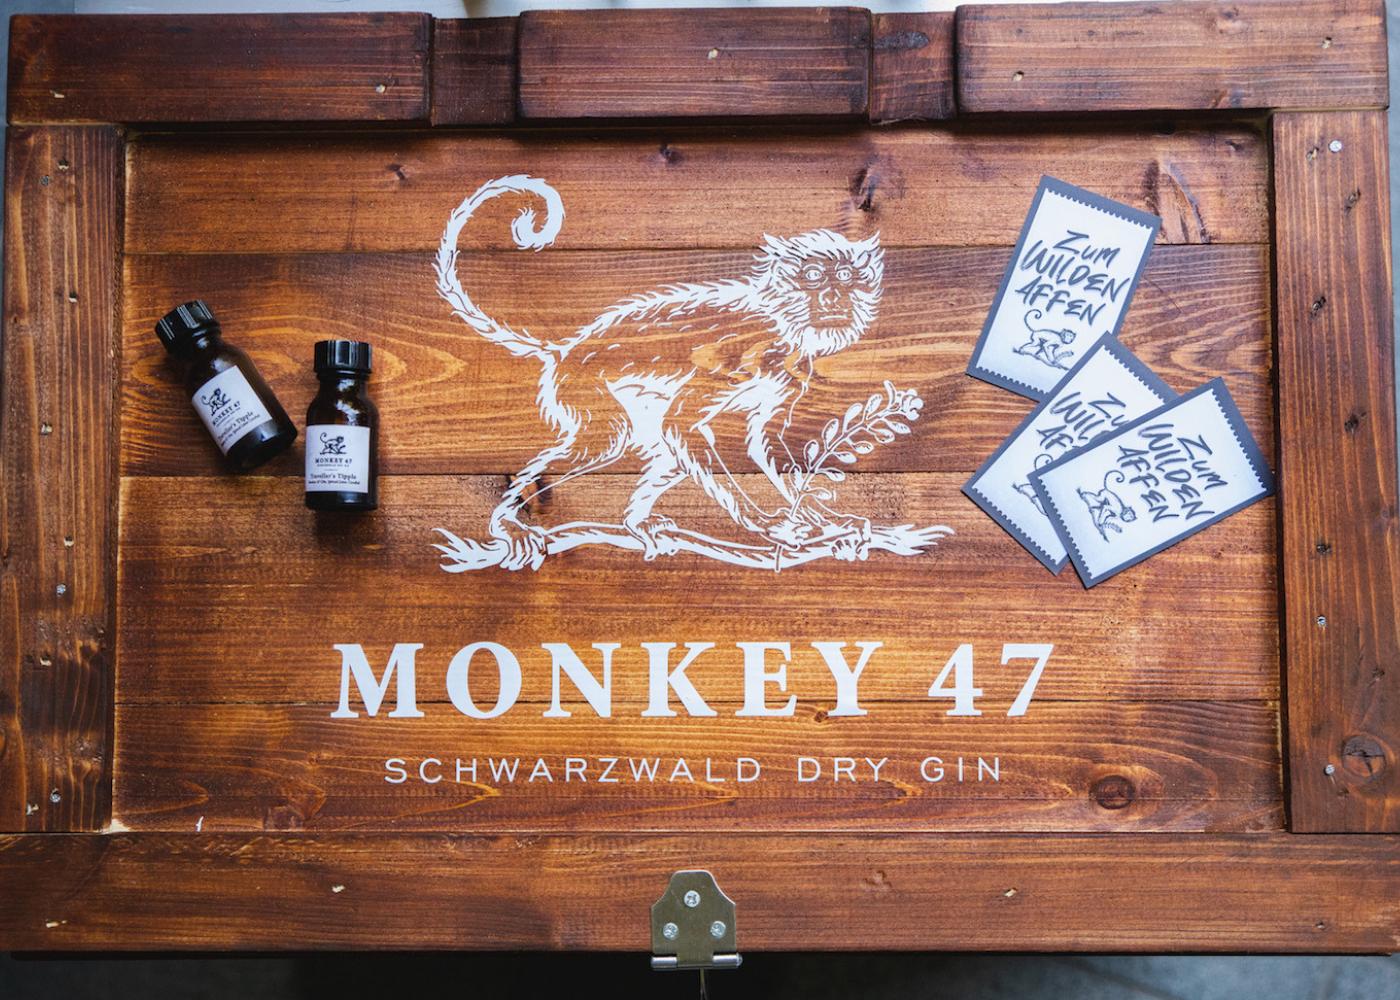 Monkey 47 pop up